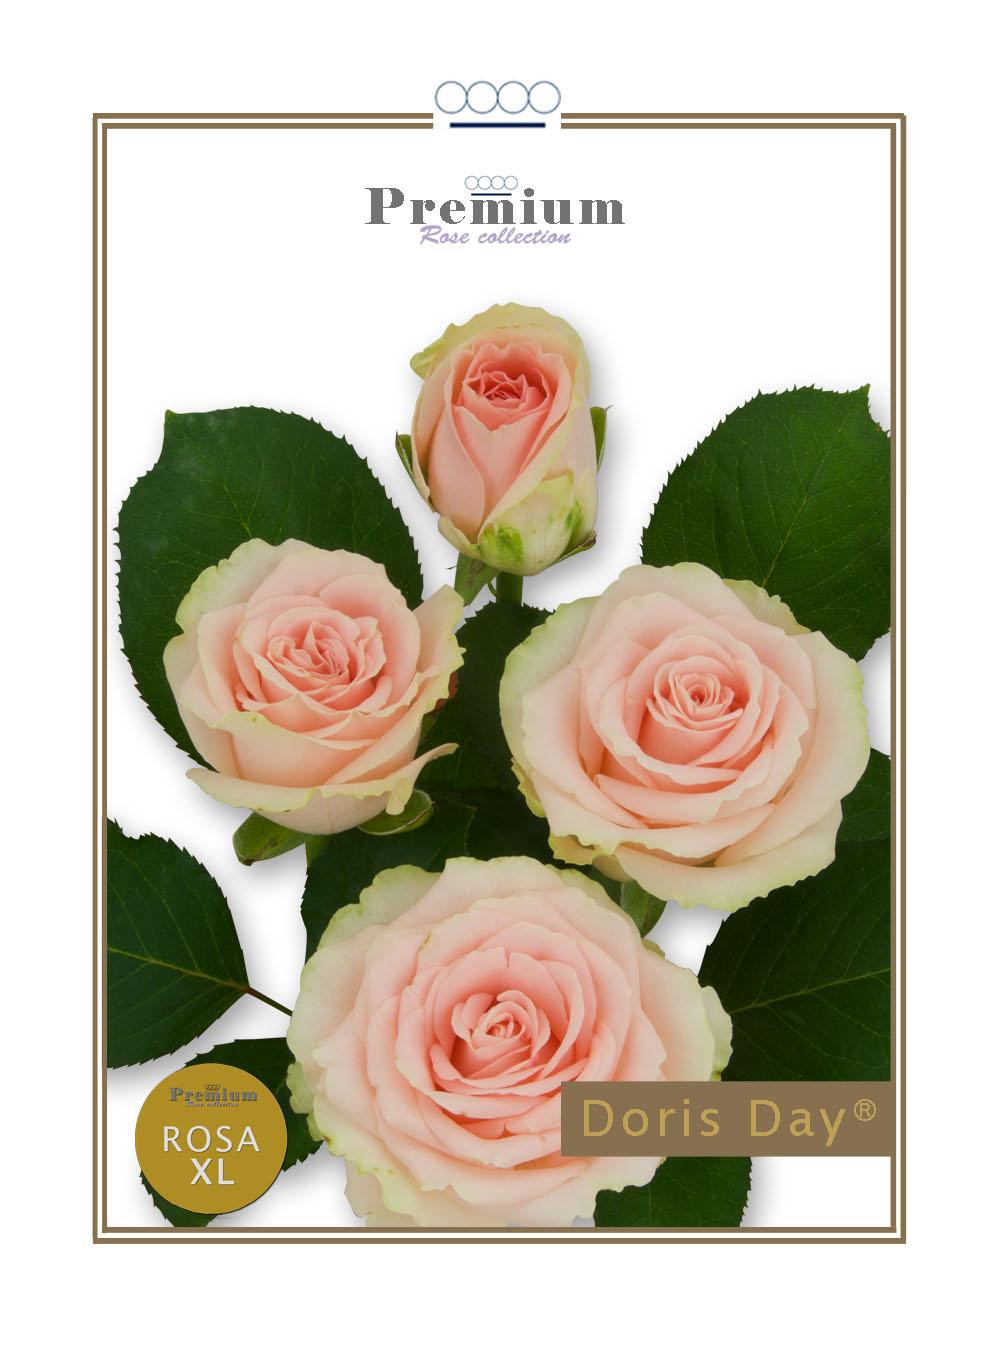 Doris Day®